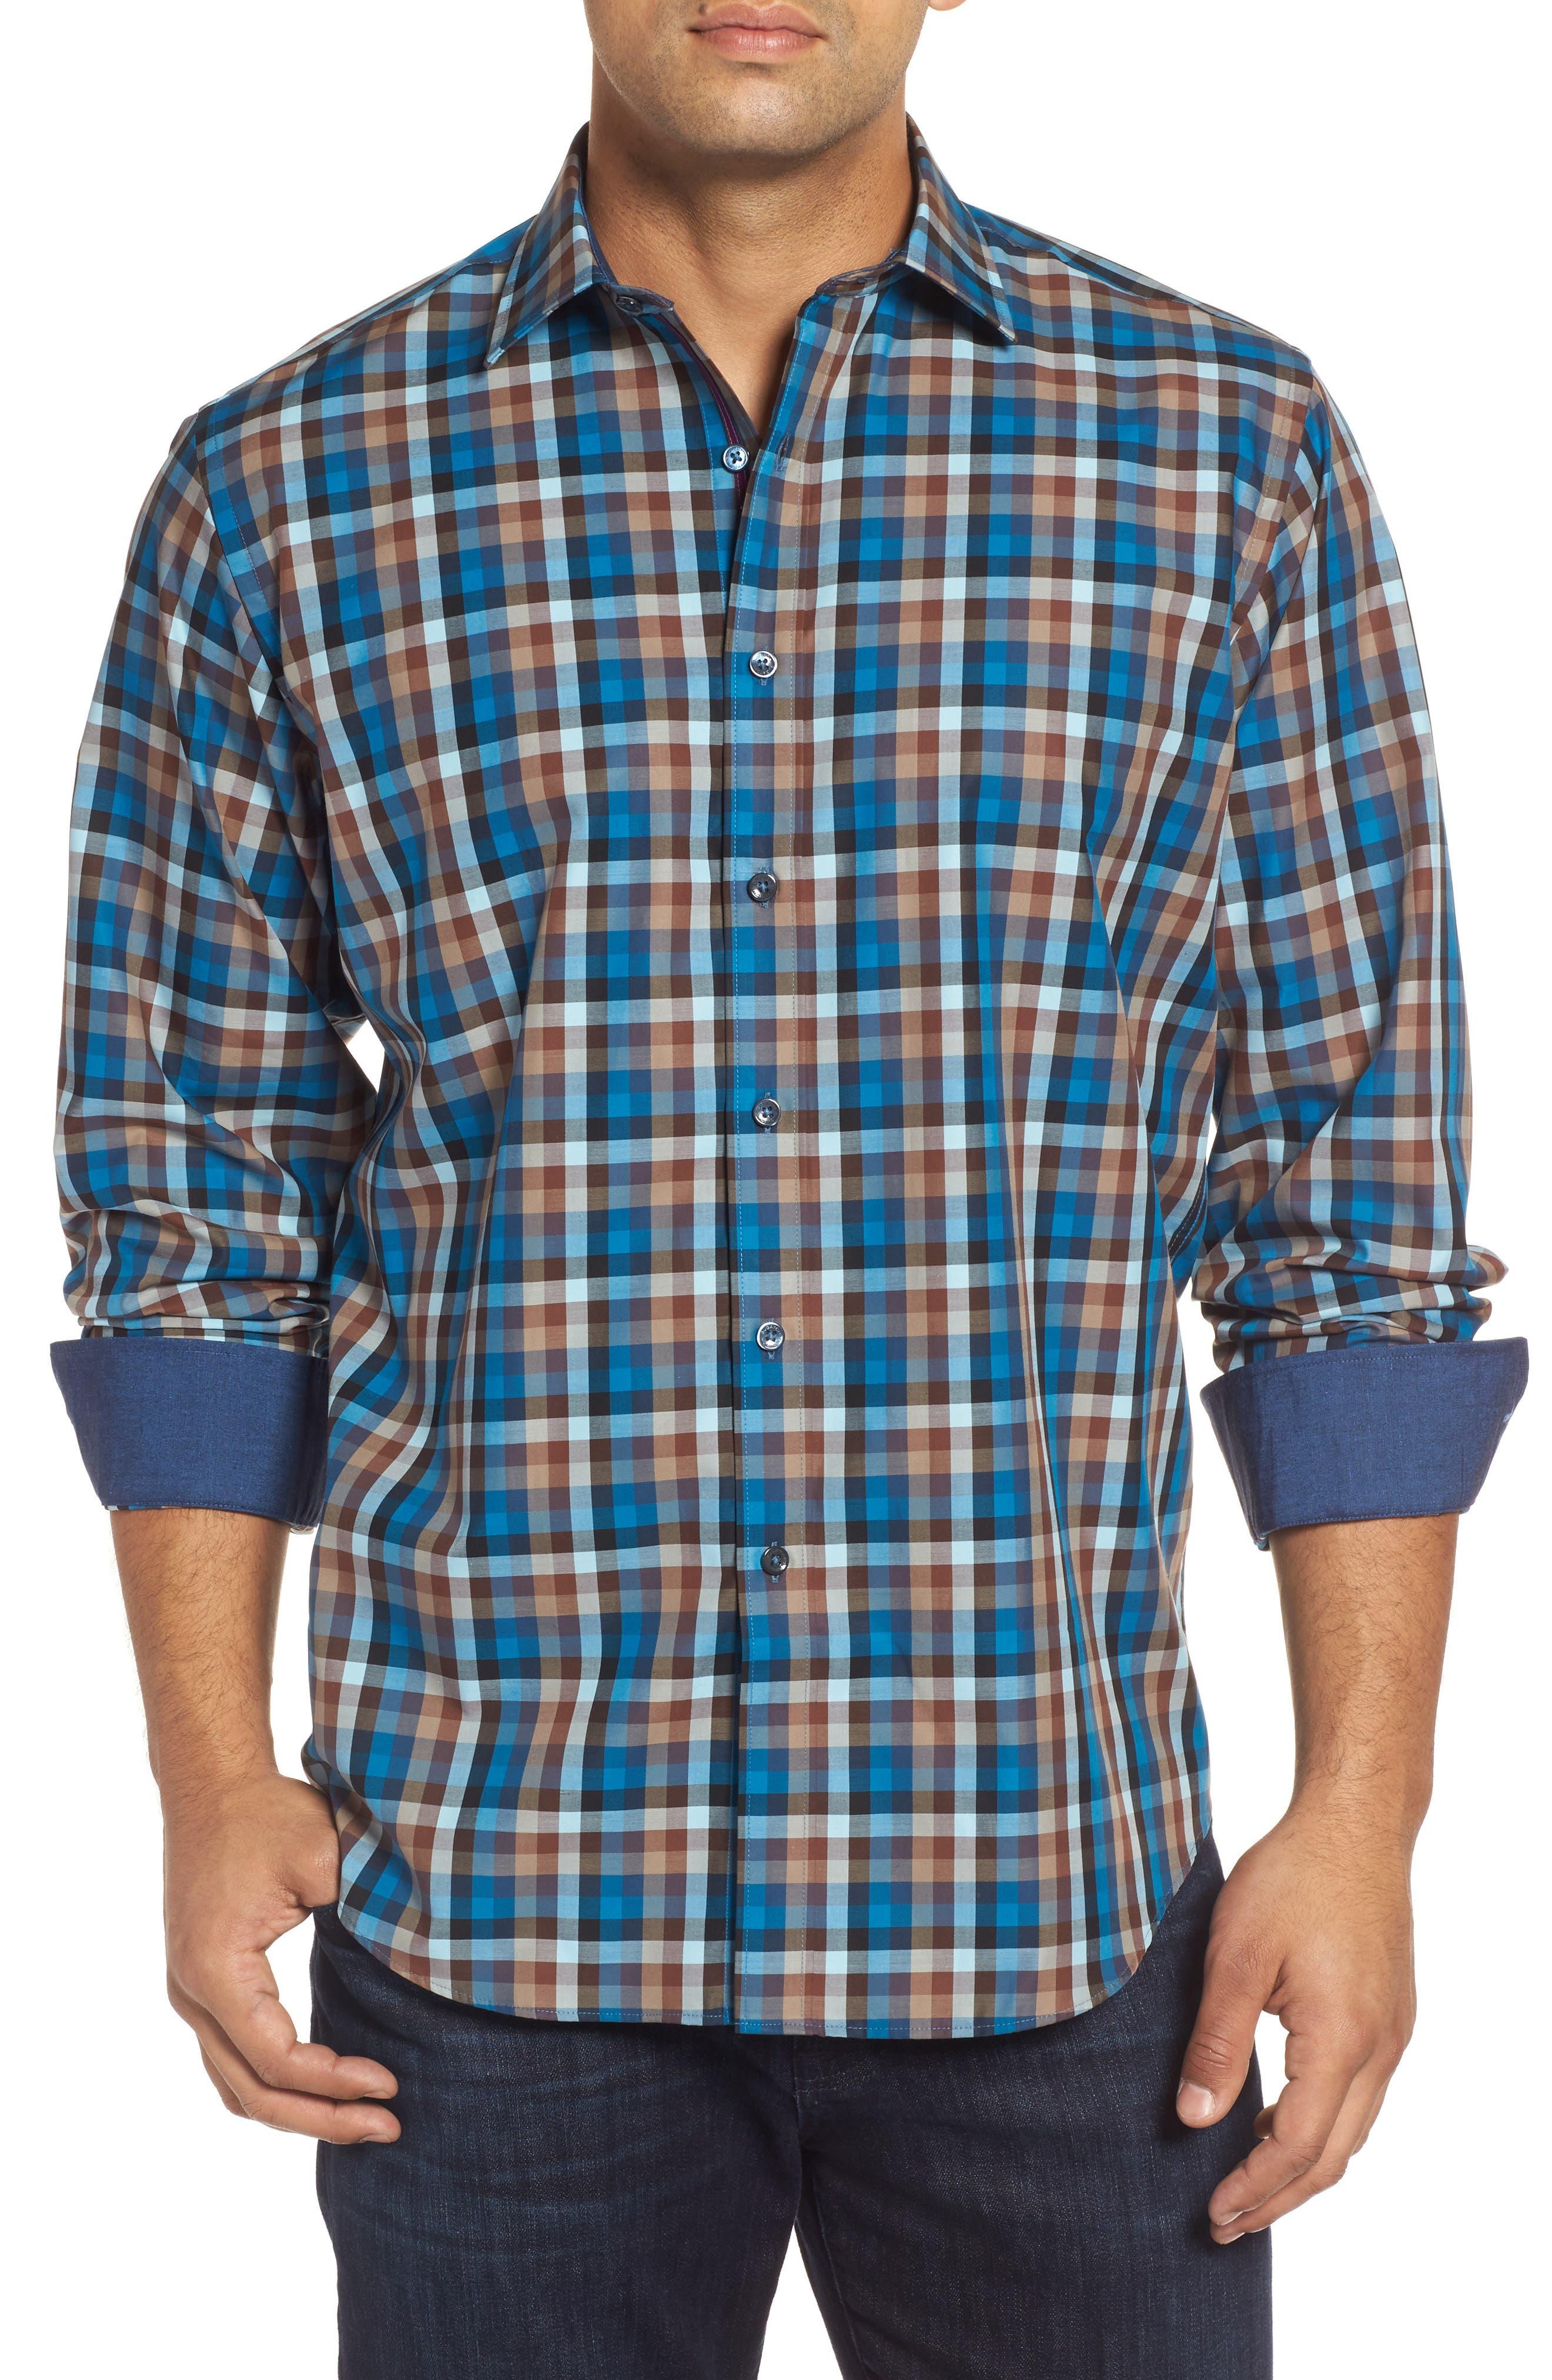 Main Image - Bugatchi Classic Fit Twill Check Sport Shirt